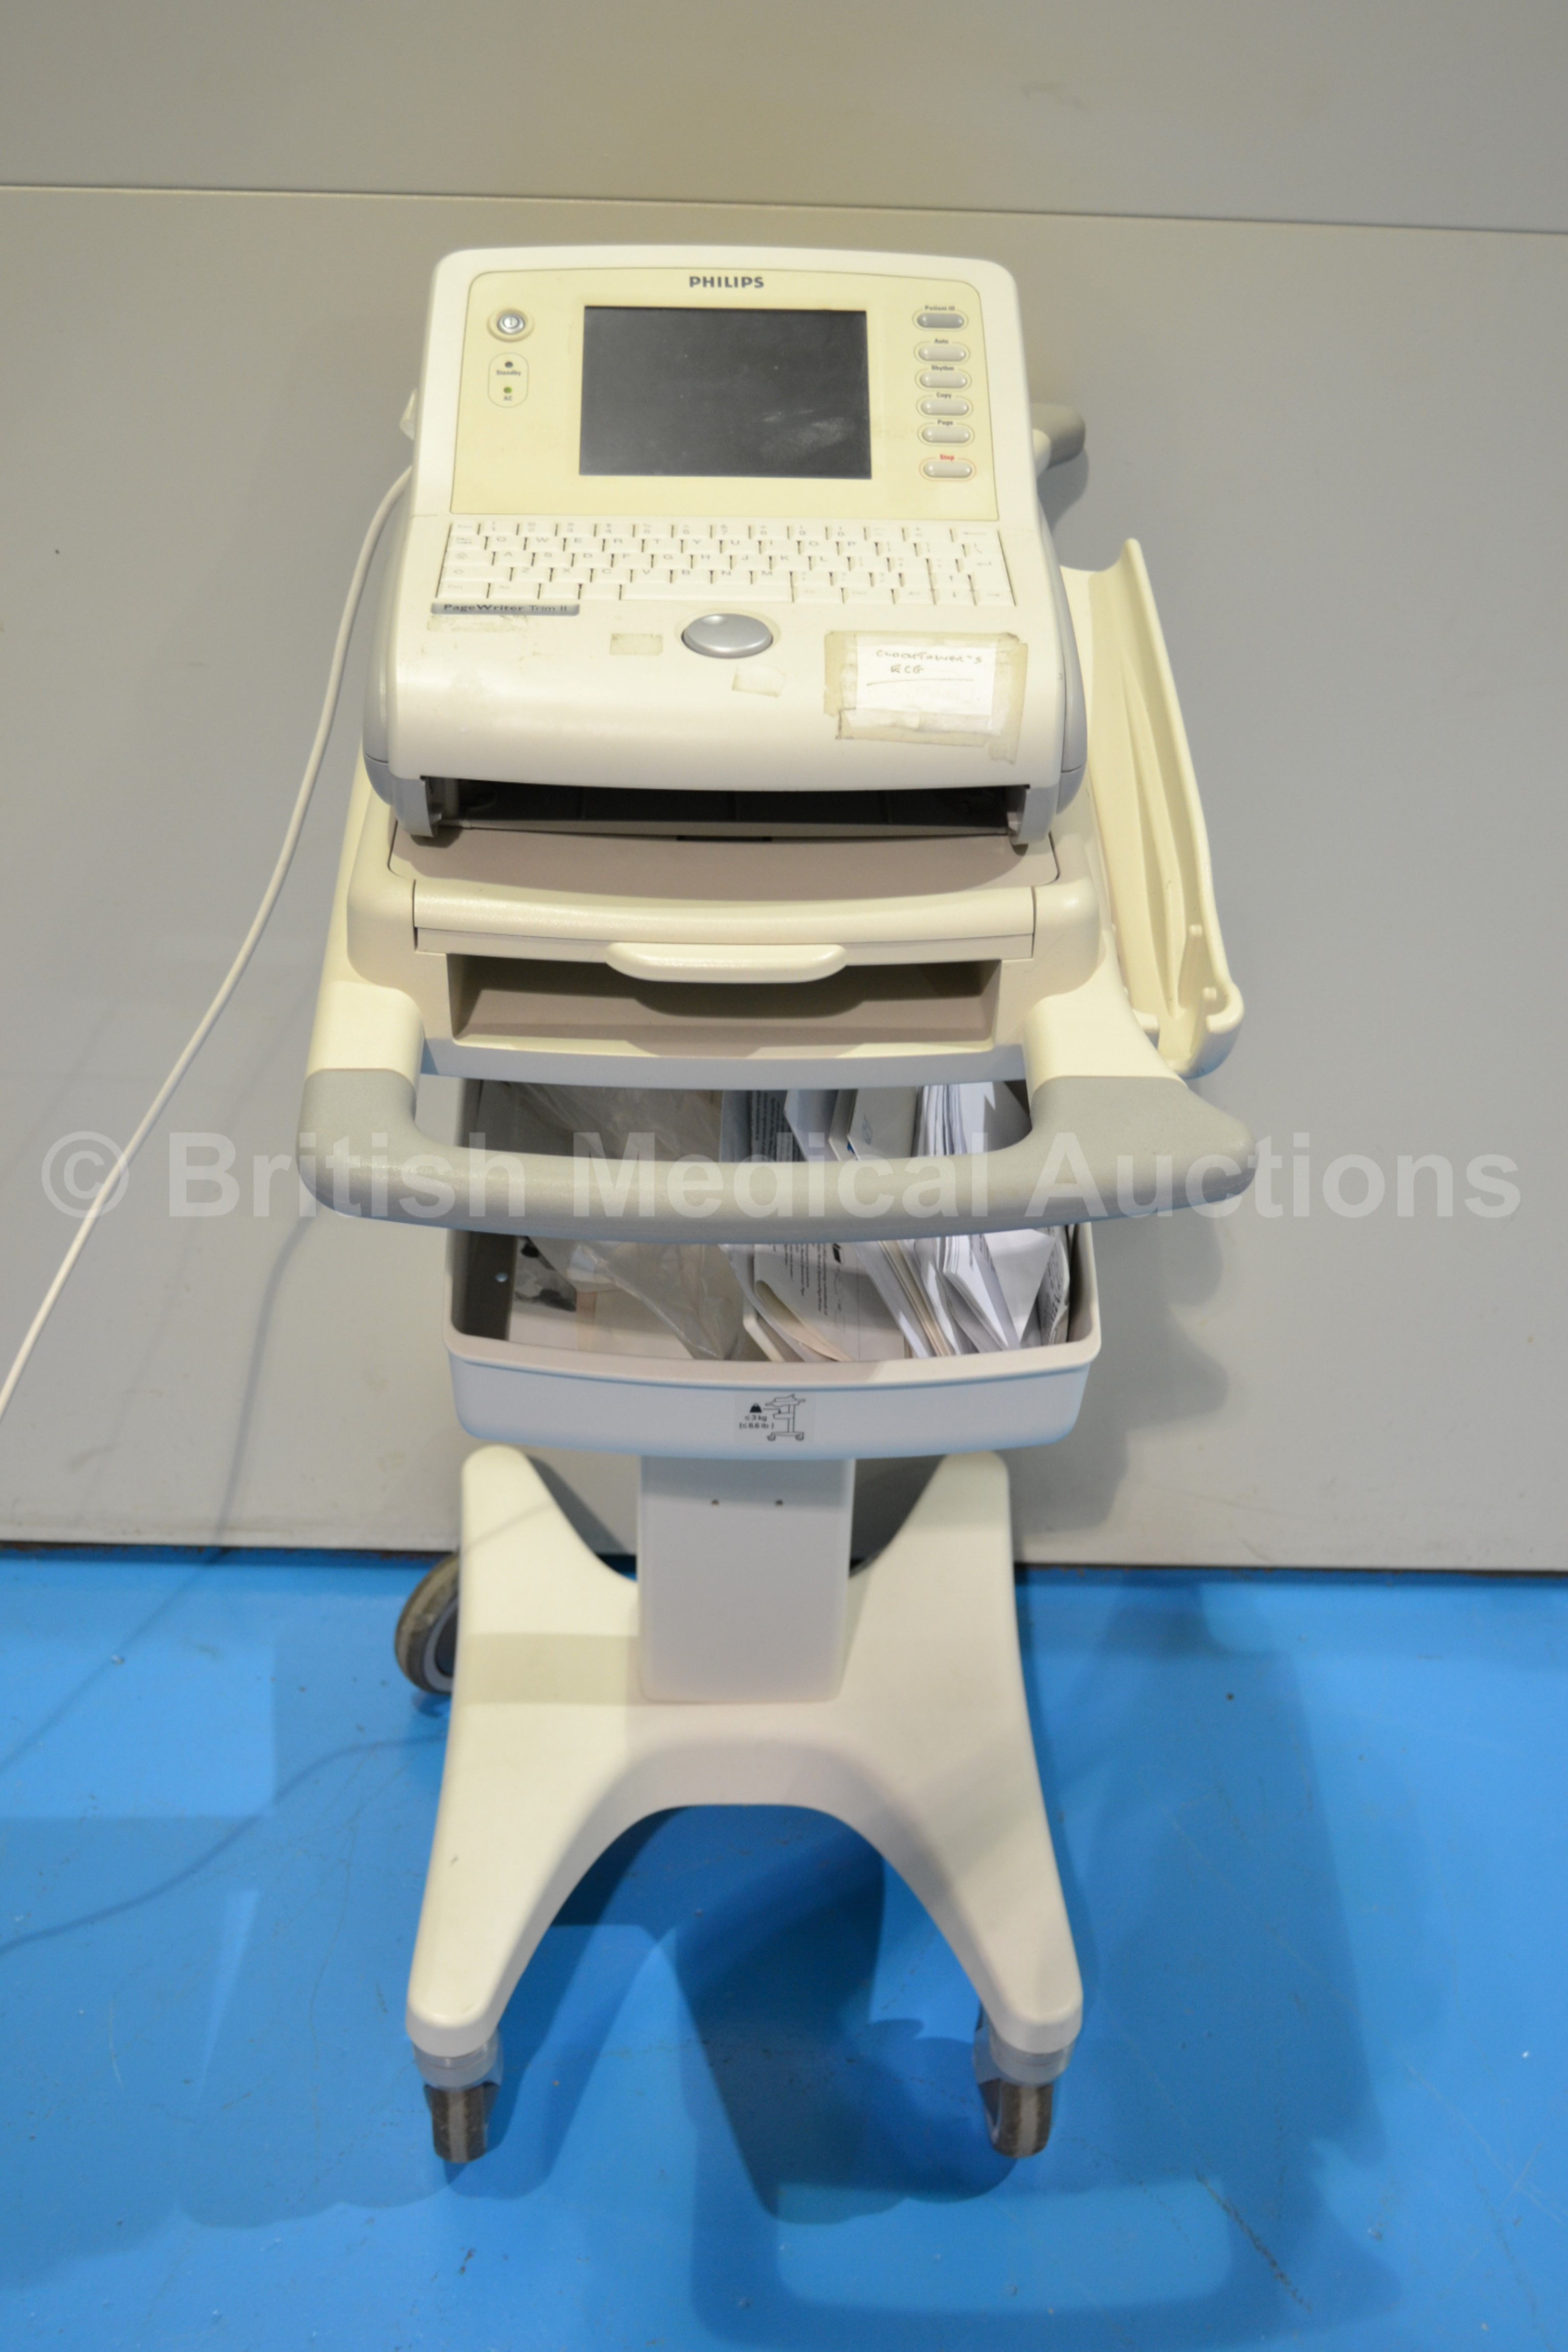 Philips Pagewriter Trim II ECG Machine on Trolley (No Power)